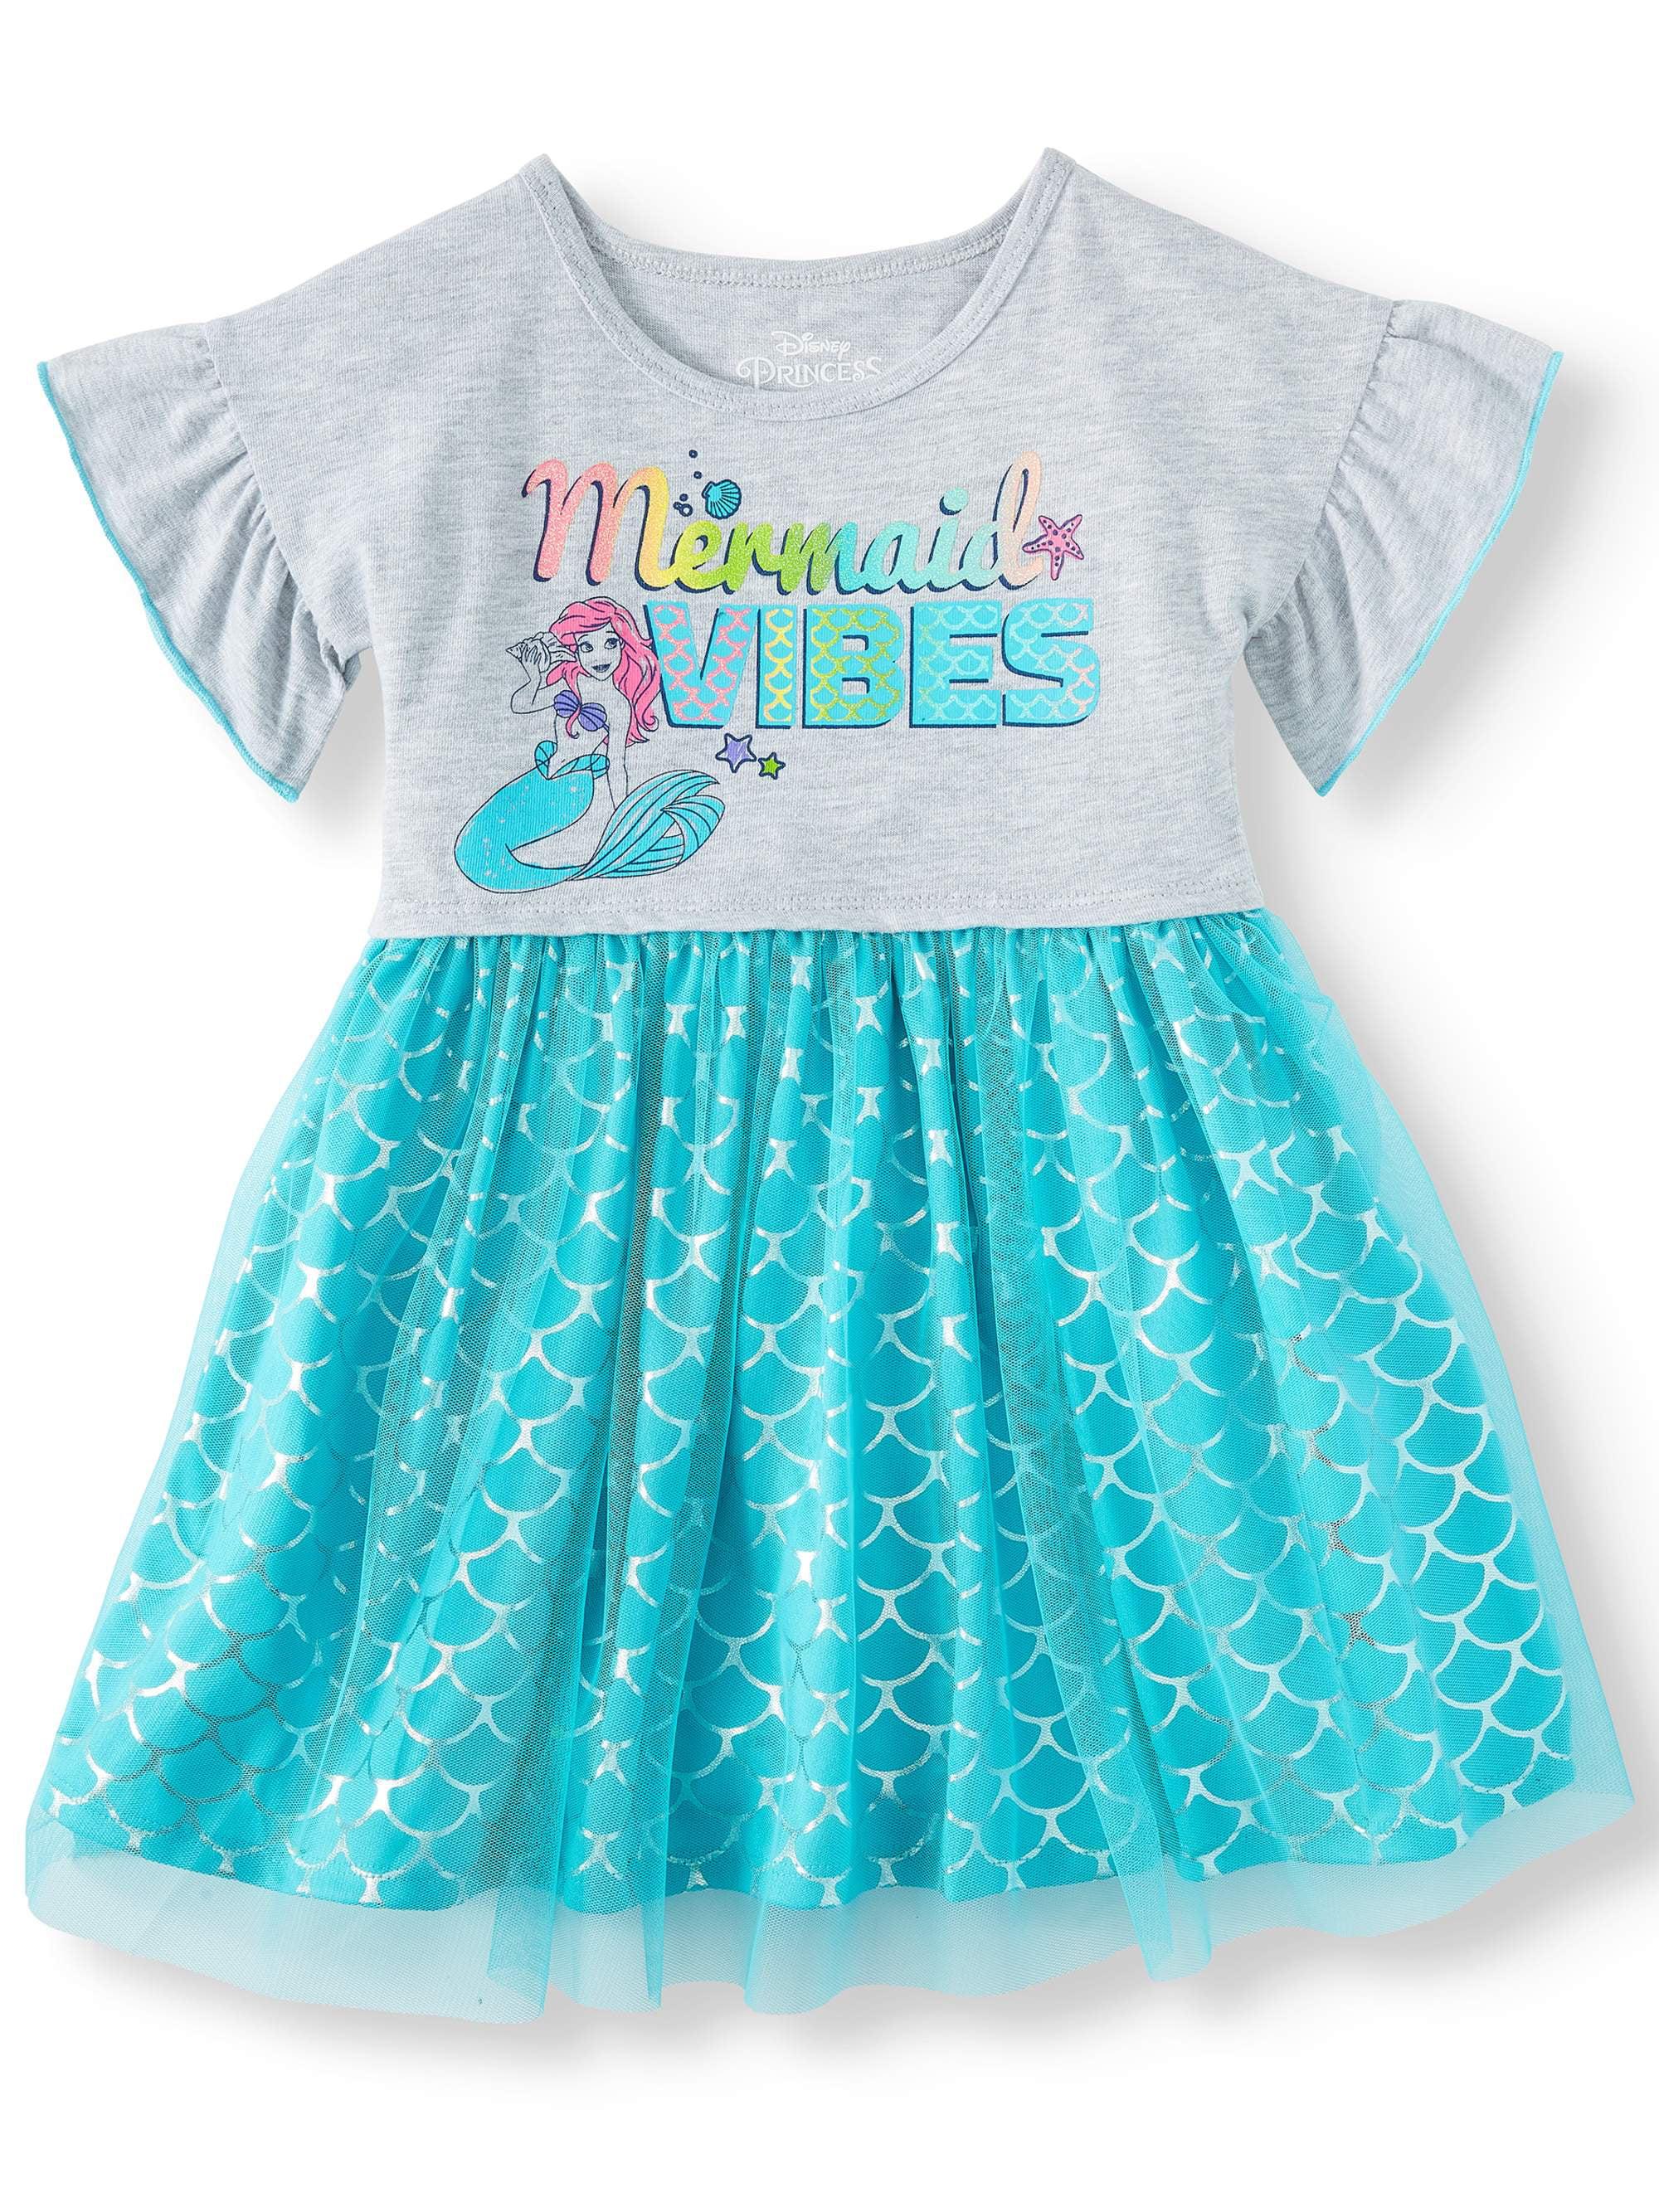 eb1c41d8e Disney Princess - The Little Mermaid Tutu Dress (Toddler Girls) - Walmart .com